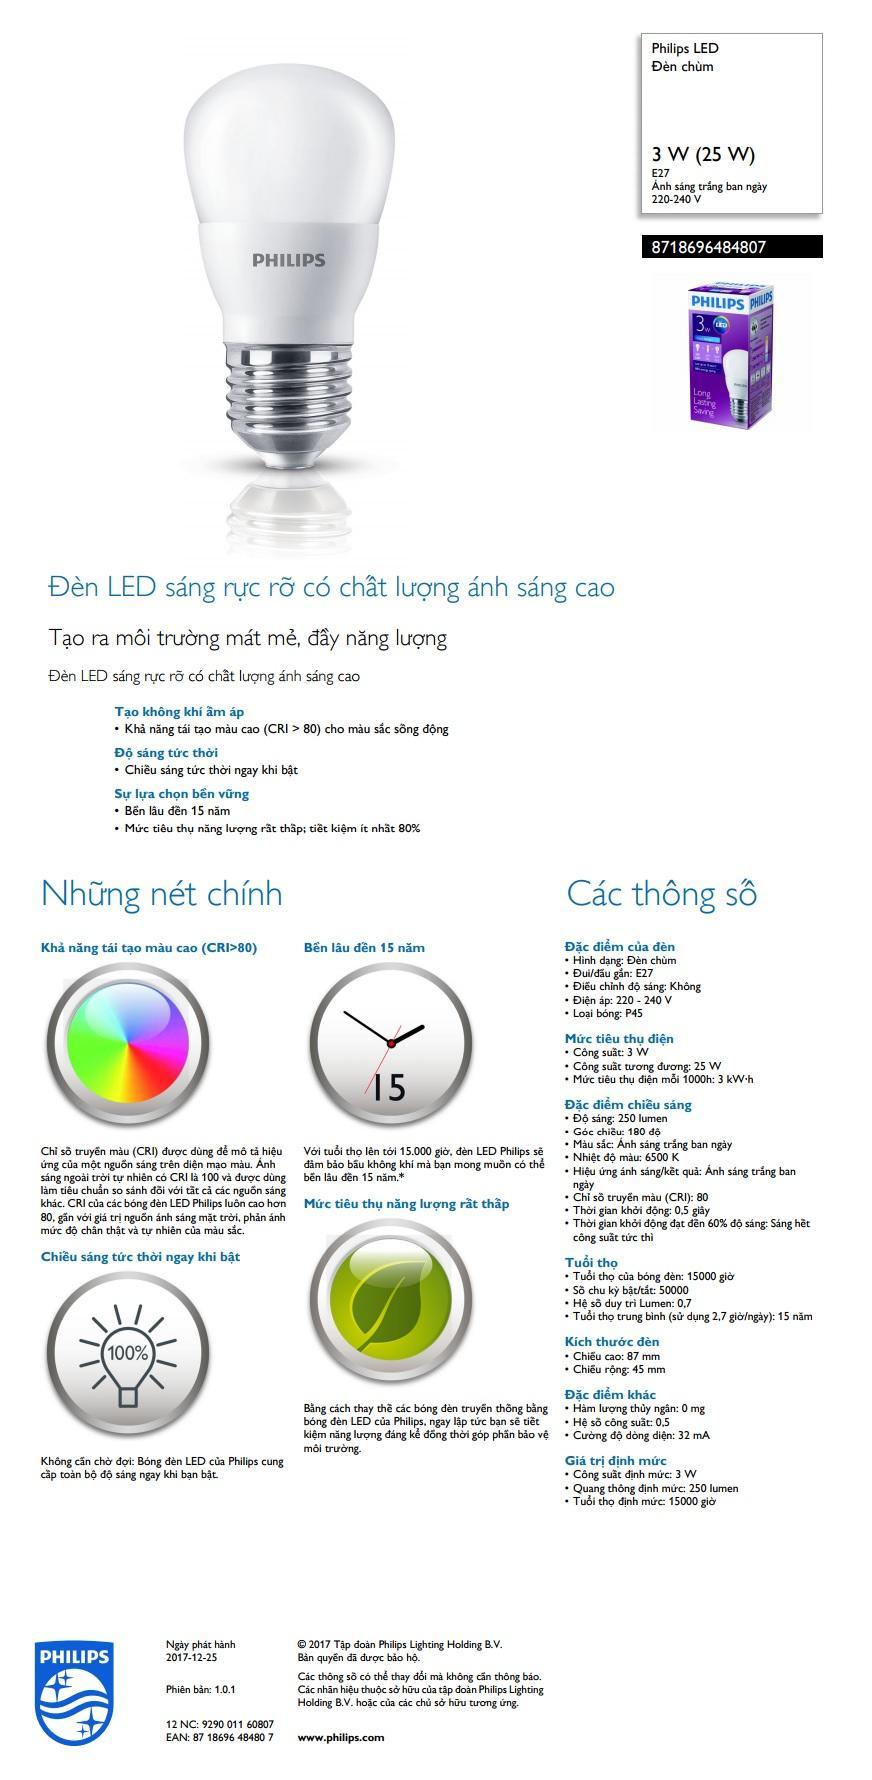 Ledbulb 3w.jpg